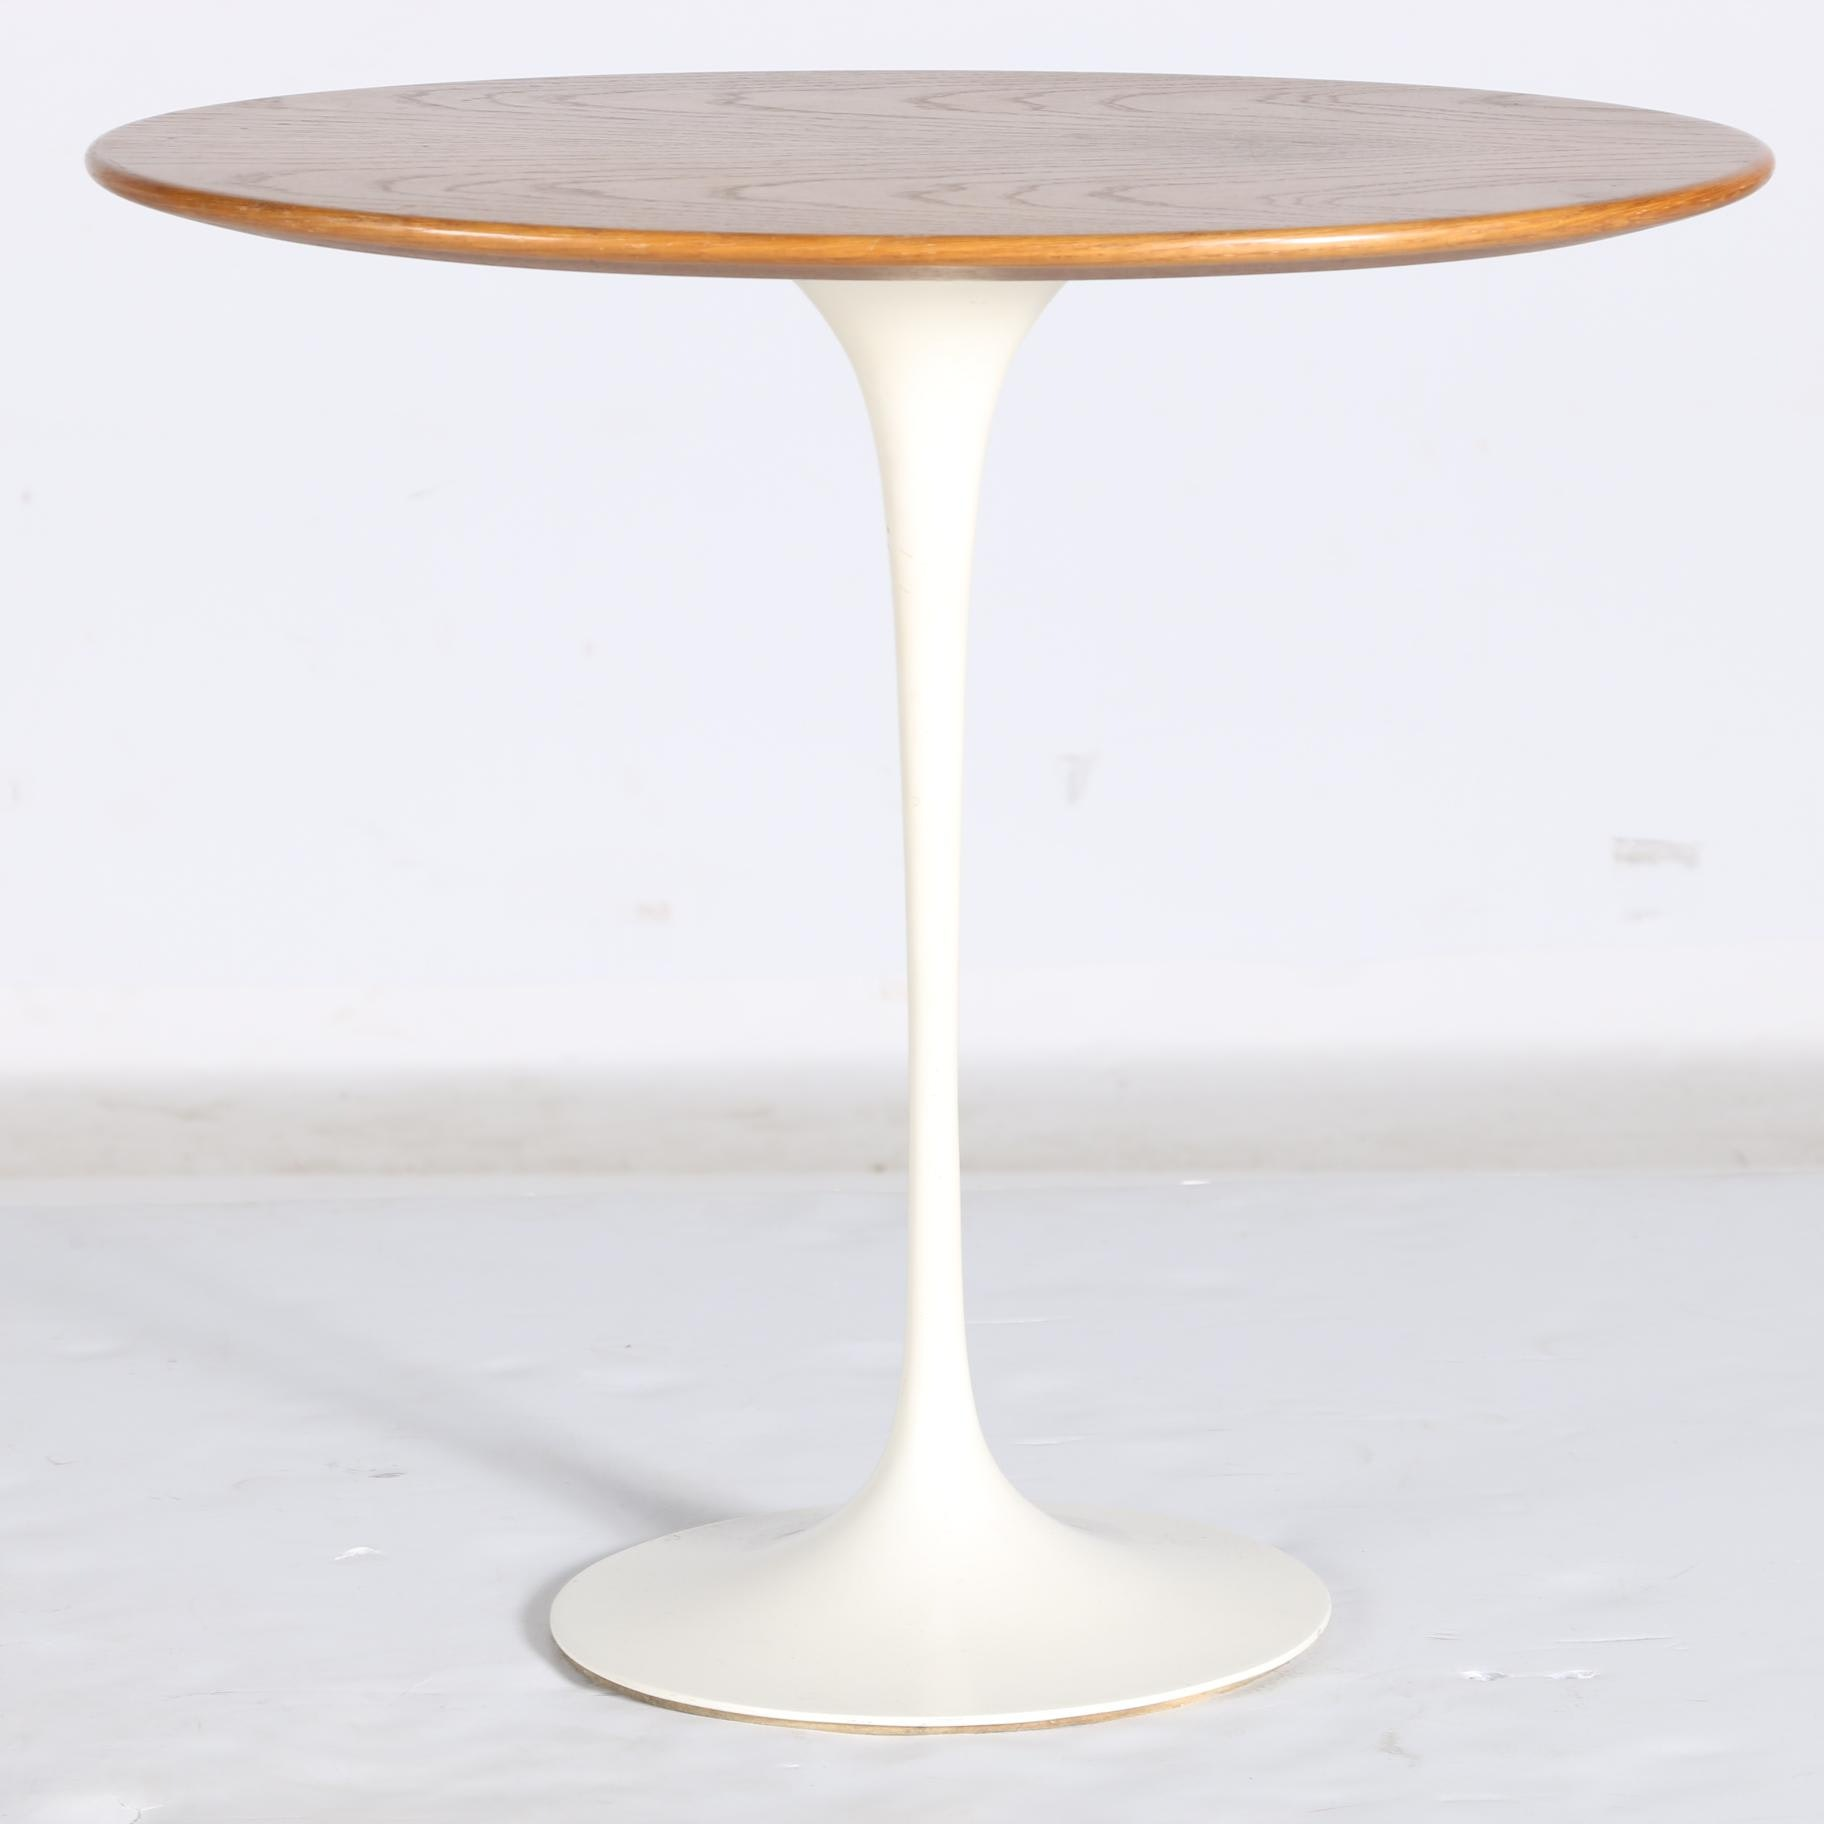 Mid Century Modern Tulip Side Table Designed by Eero Saarinen for Knoll